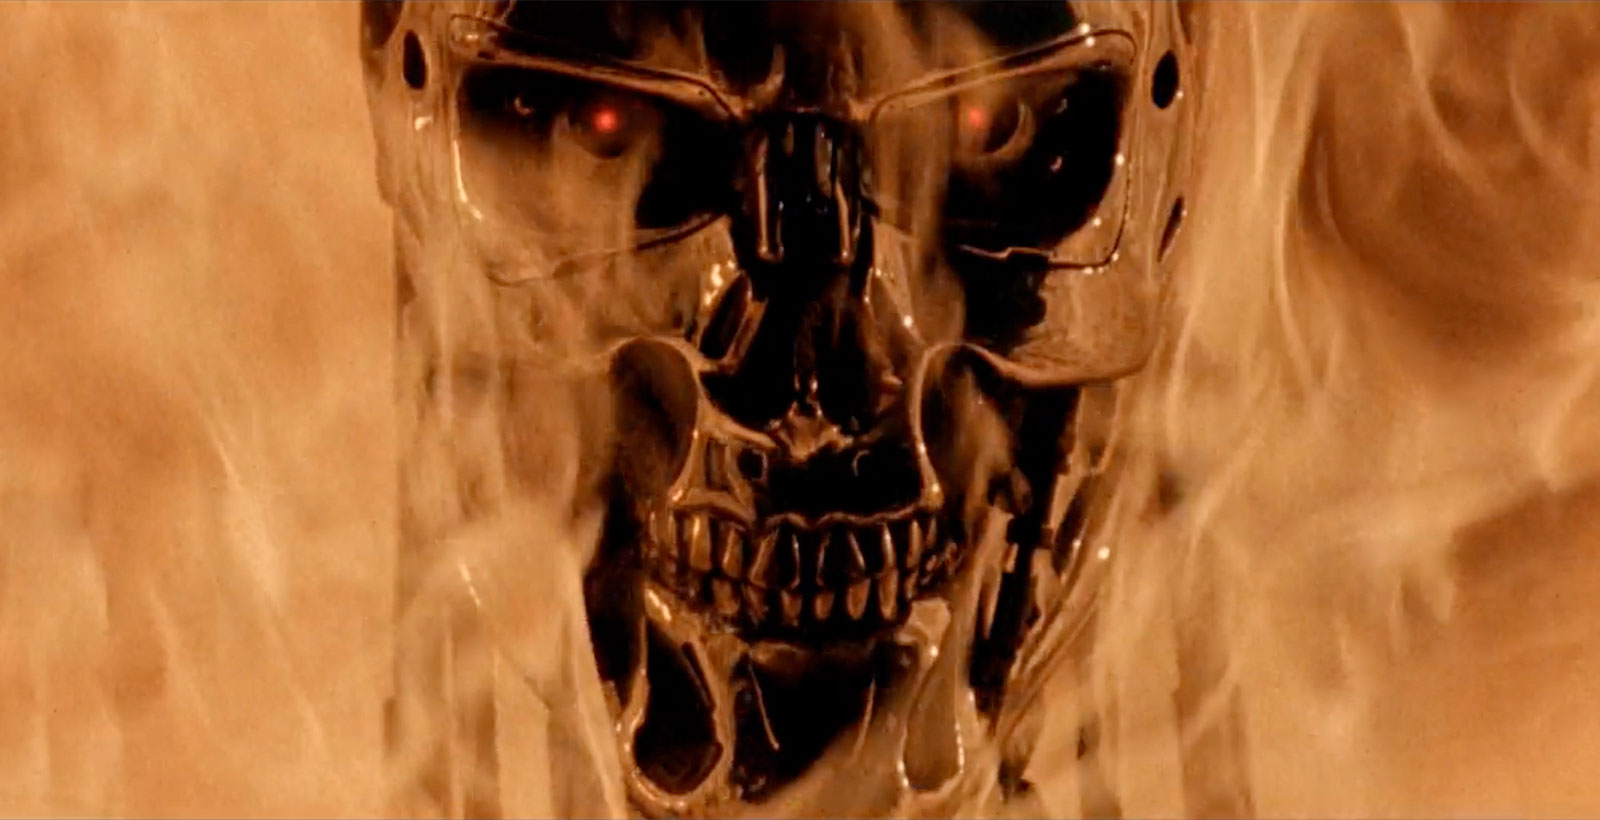 La terrifiante introduction du film Terminator 2: Judgment Day (Image : Tri-Star Pictures).